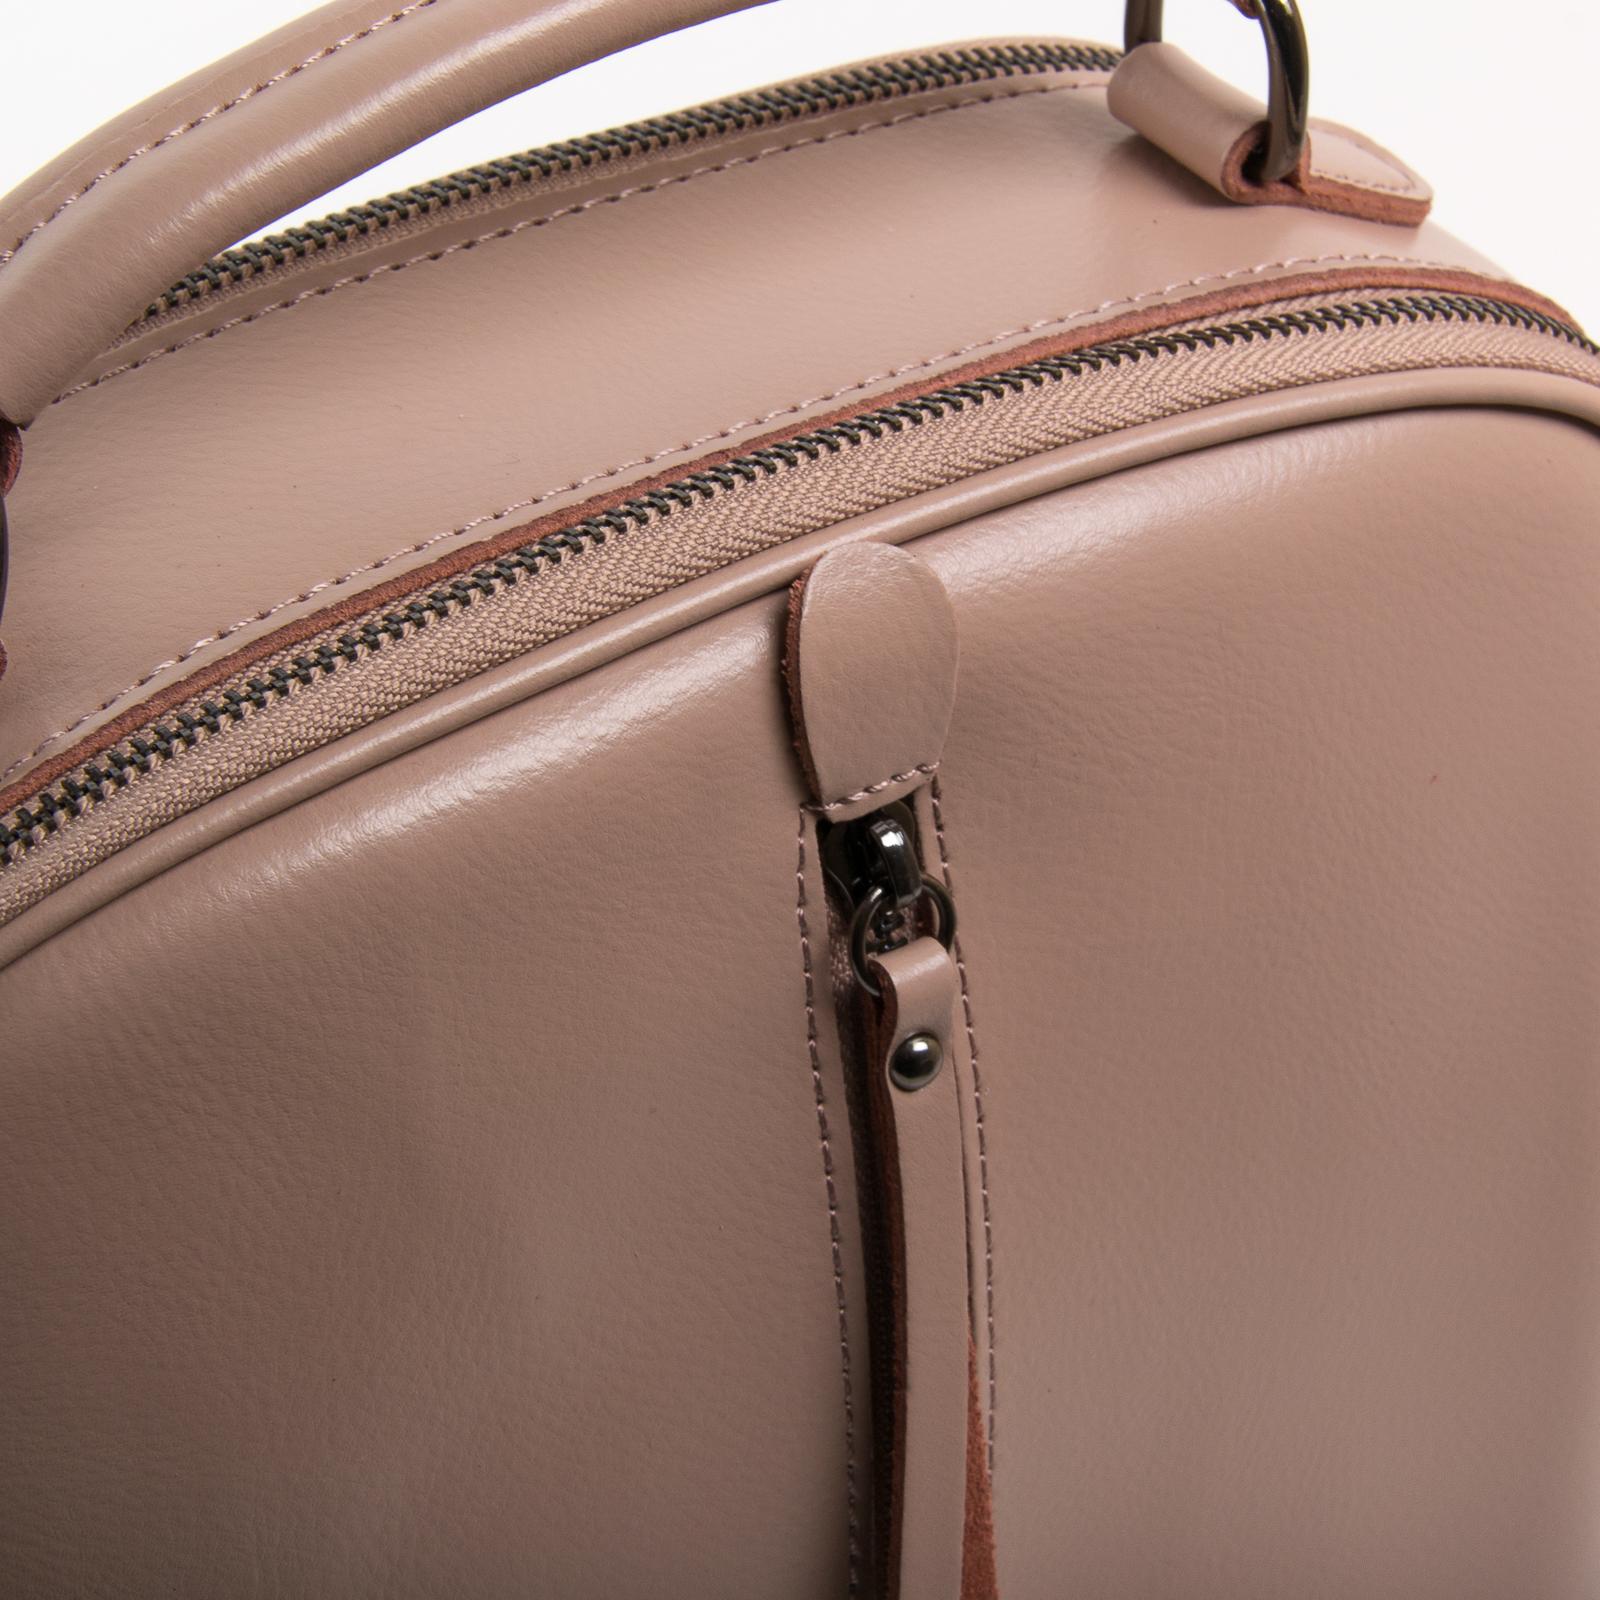 Сумка Женская Рюкзак кожа ALEX RAI 8694-3 pink - фото 3